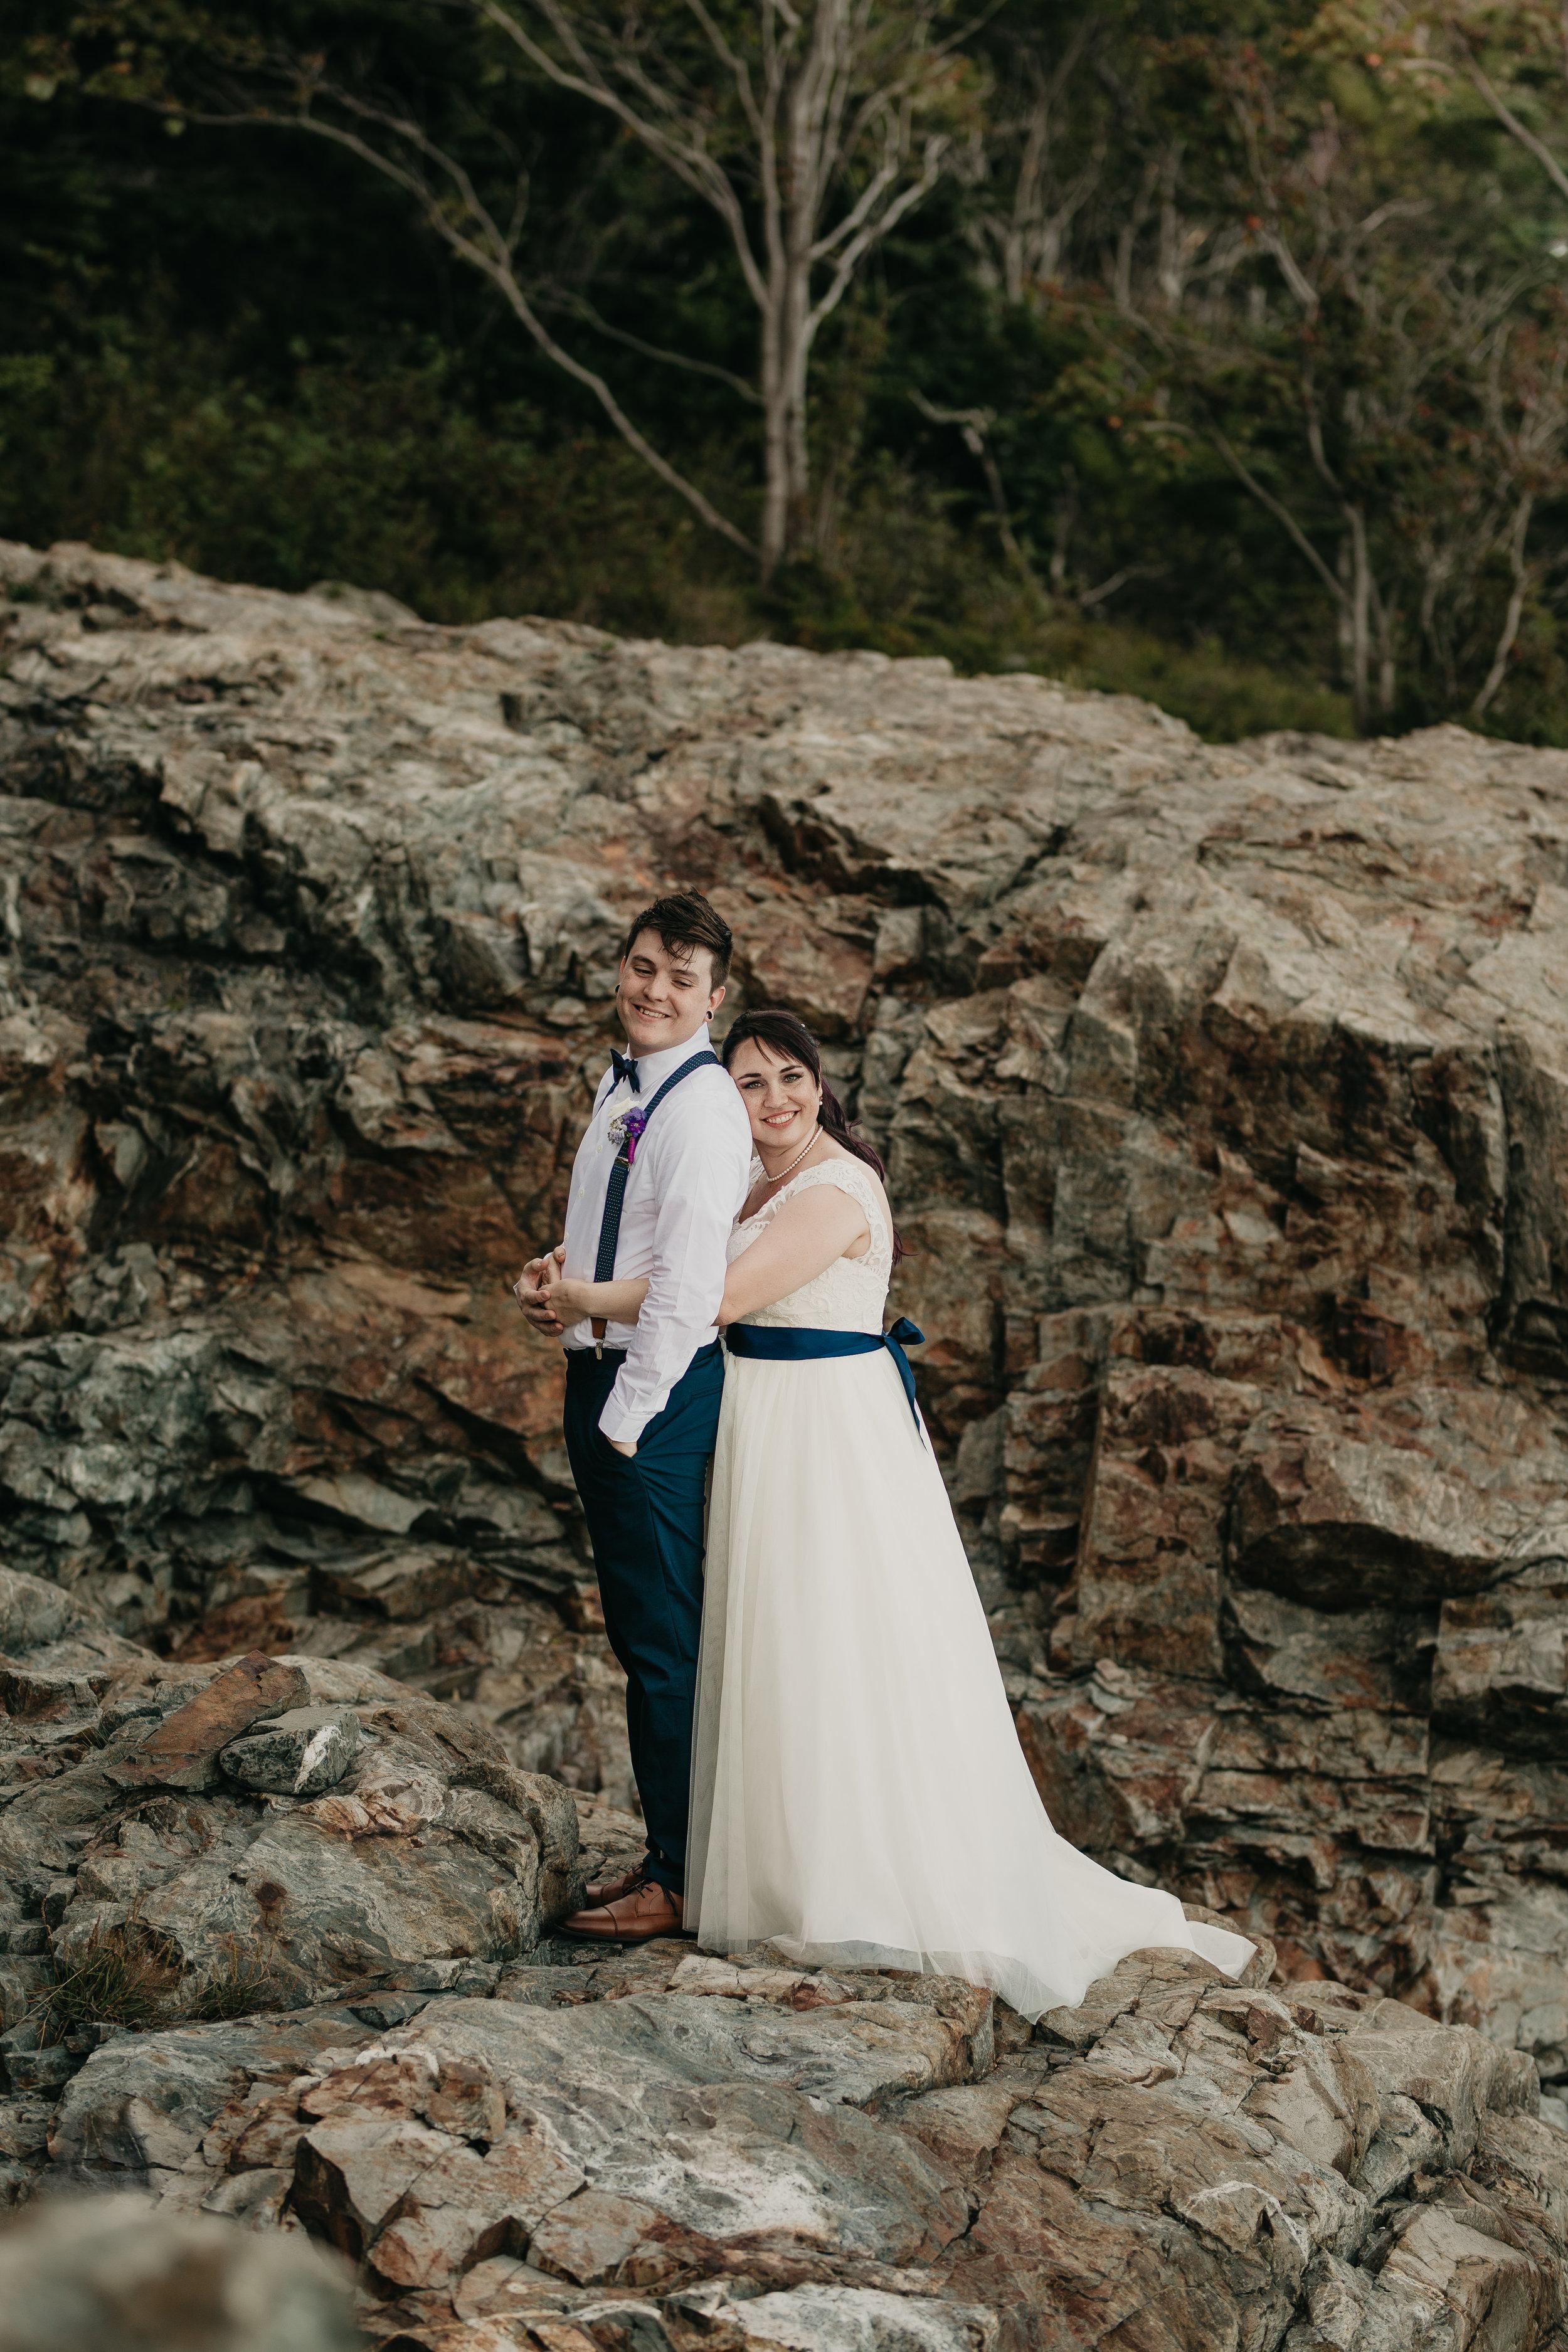 nicole-daacke-photography-Elopement-rocky-shoreline-coast-Acadia-National-Park-elopement-photographer-inspiration-maine-elopement-otter-cliffs-schoonic-head-point-37.jpg